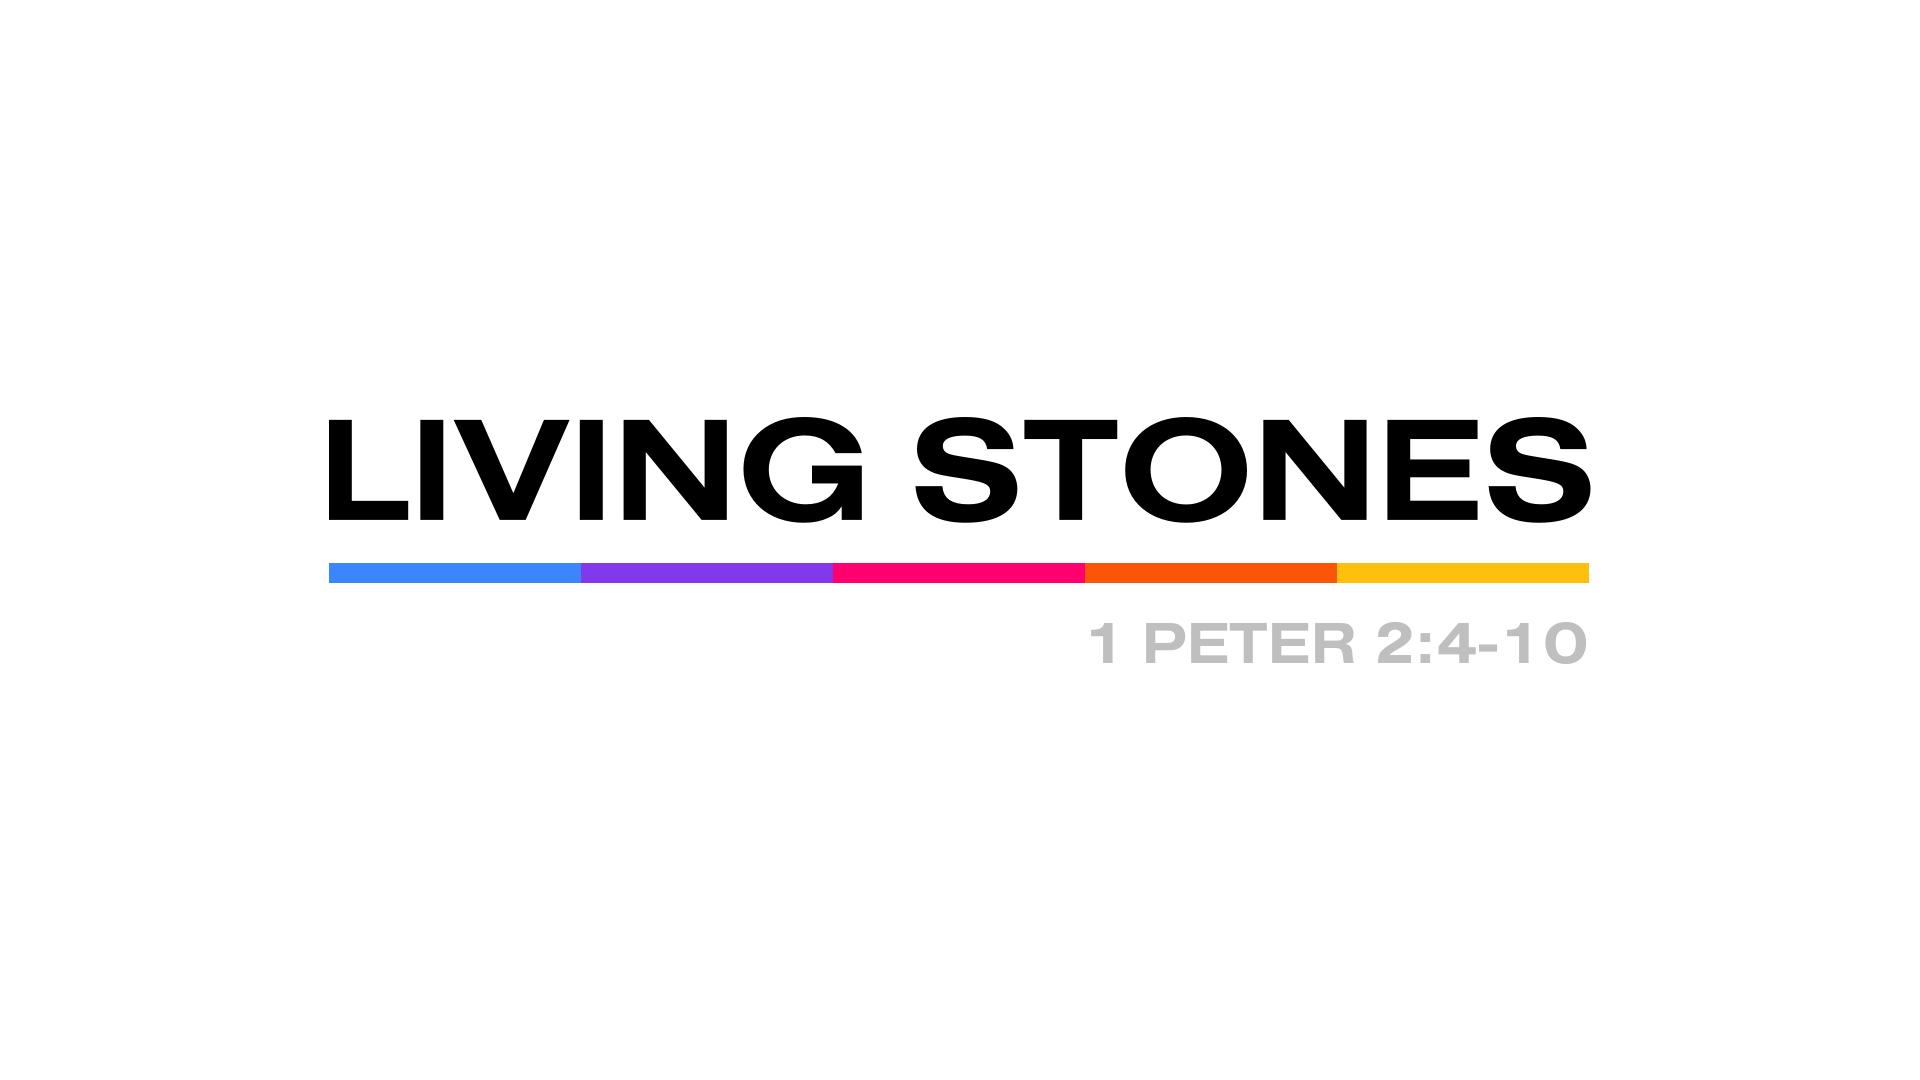 Living Stones / 1 Peter 2:4-10